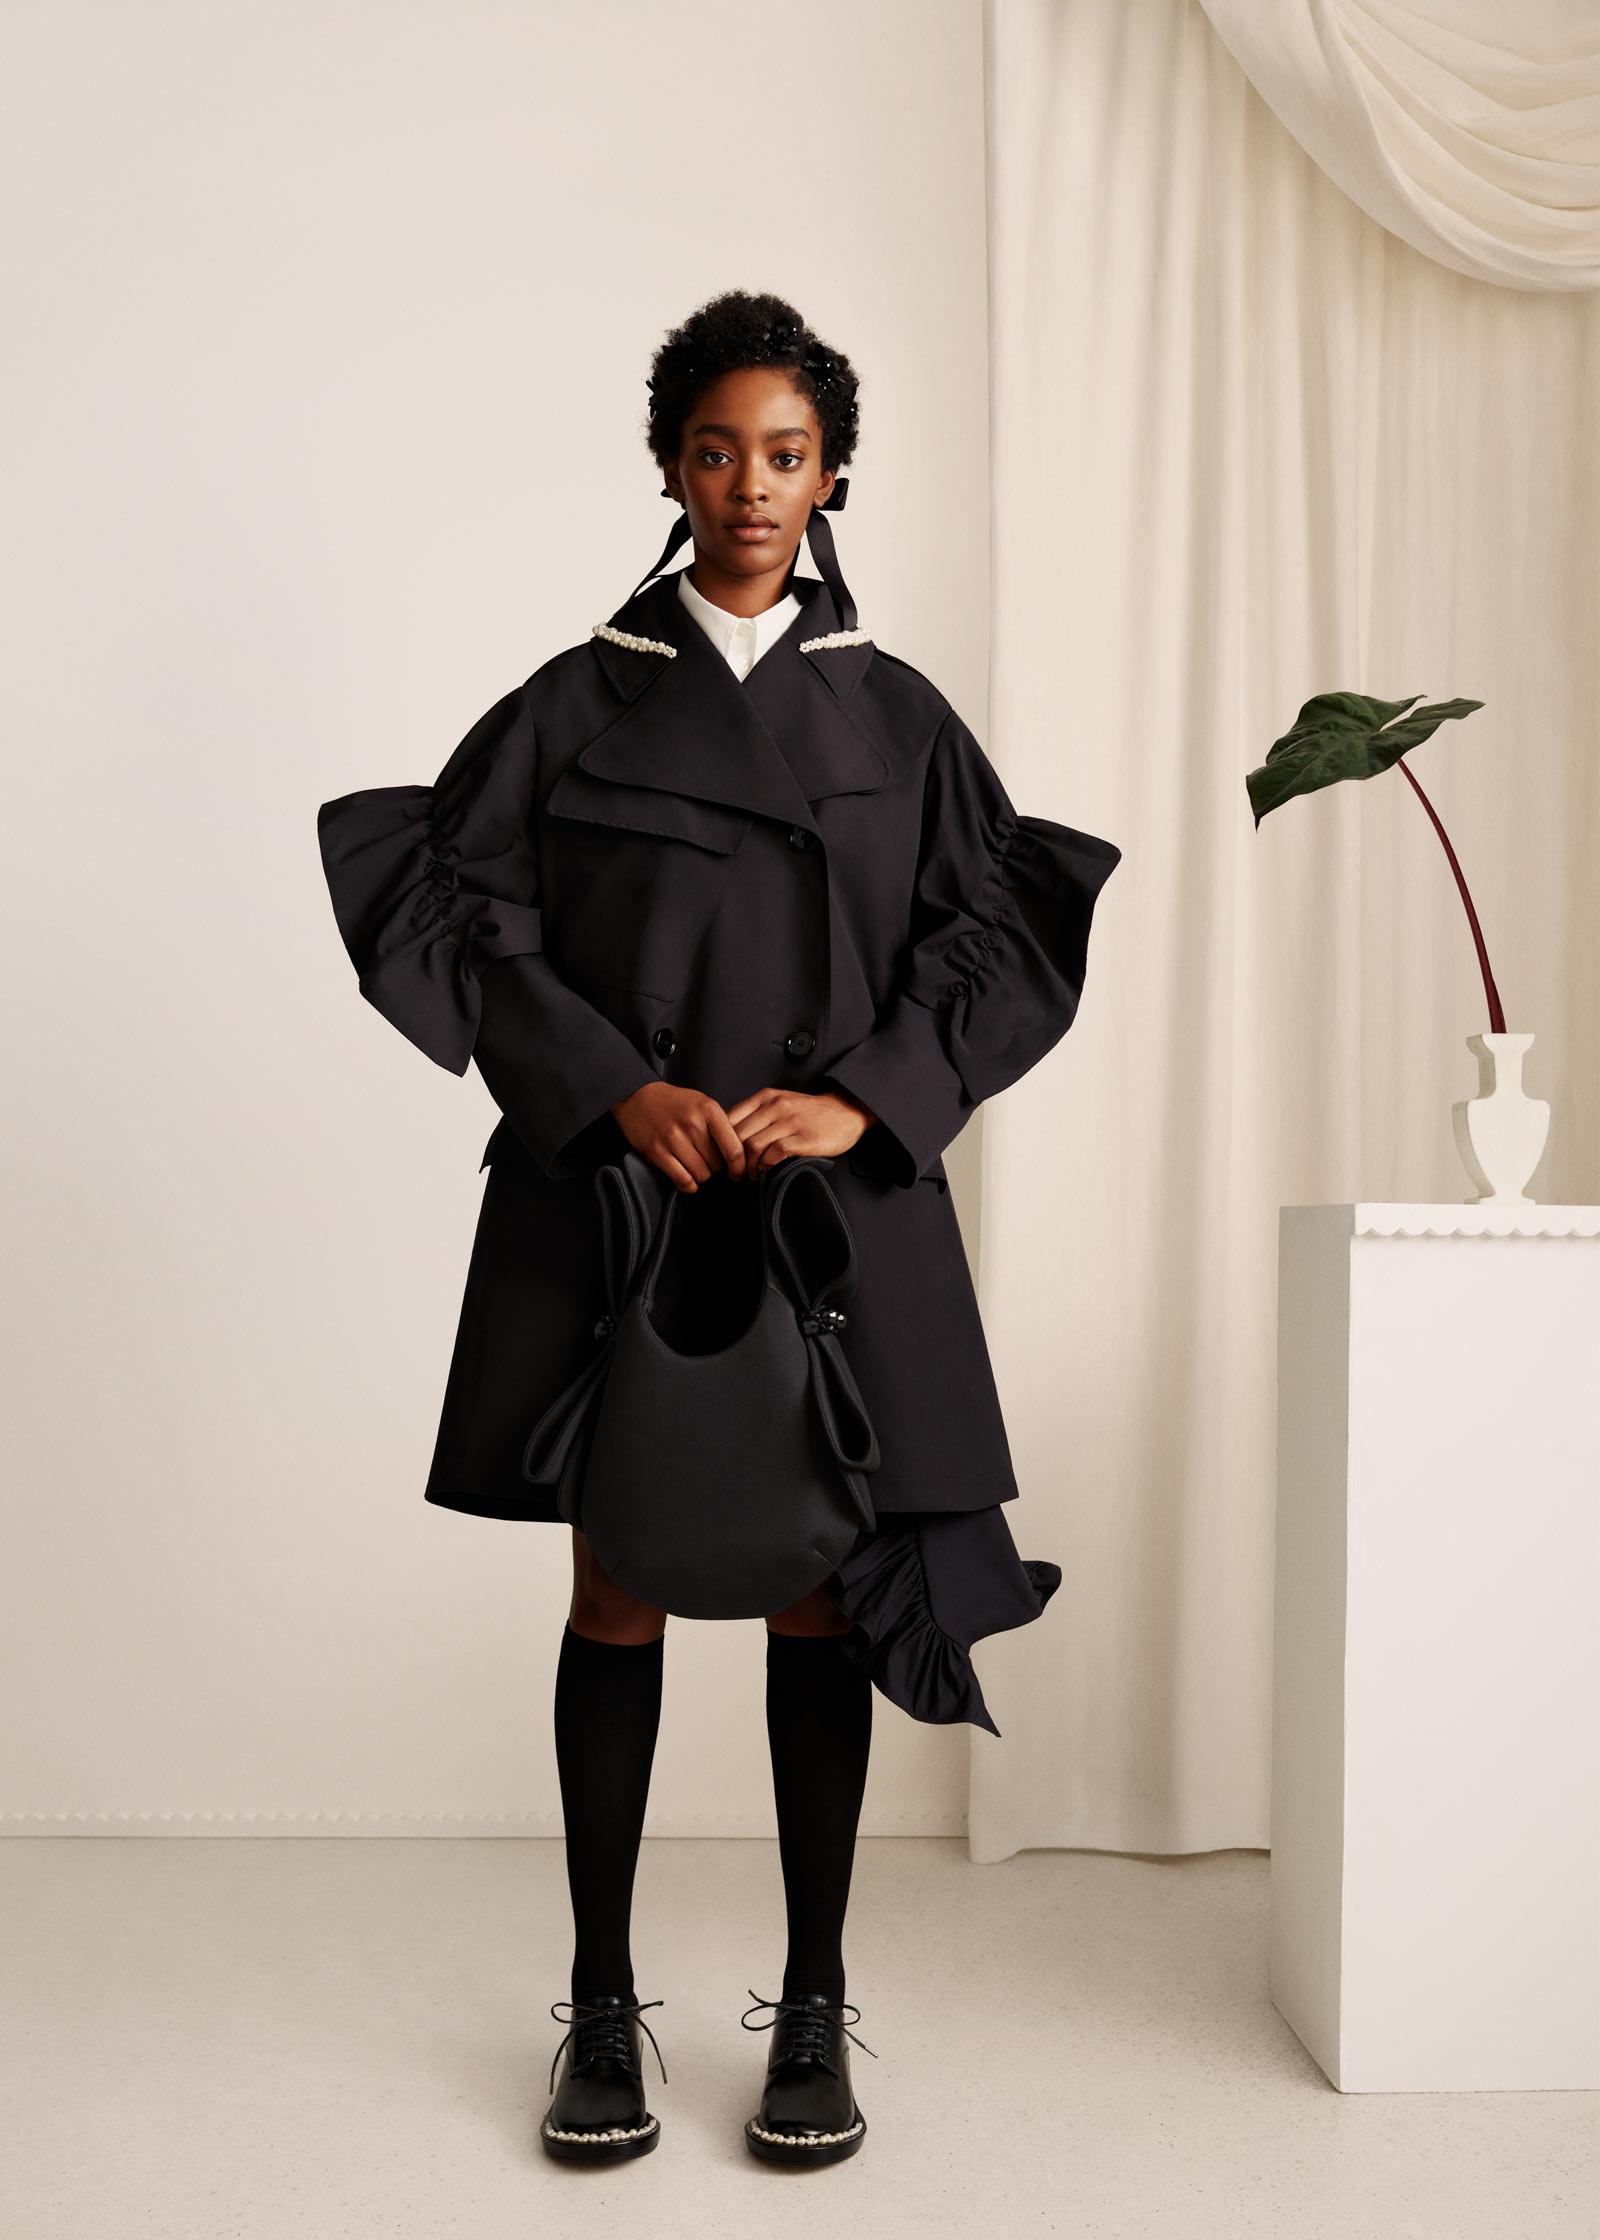 HM Simone Rocha Black Coat